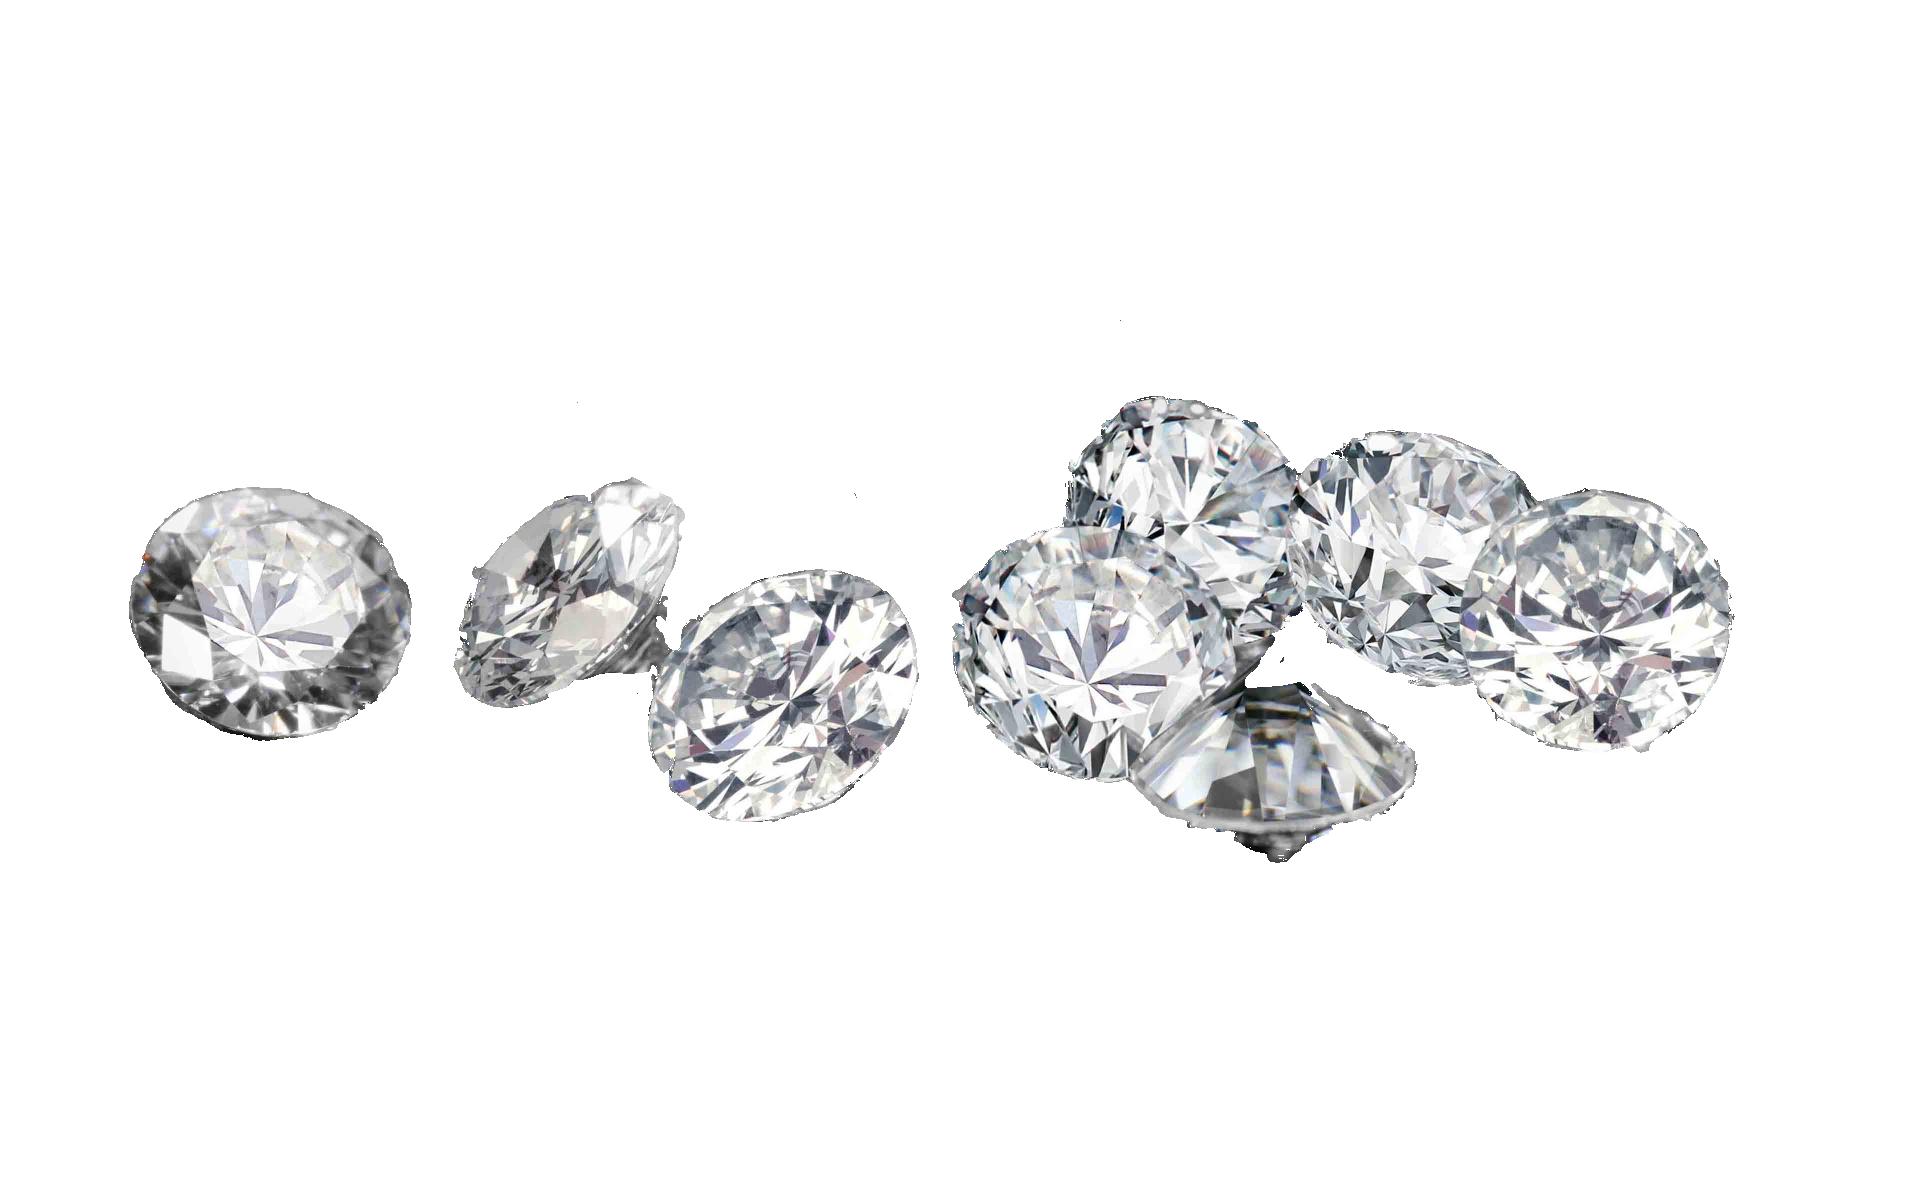 Diamond clipart dimond. White png image purepng